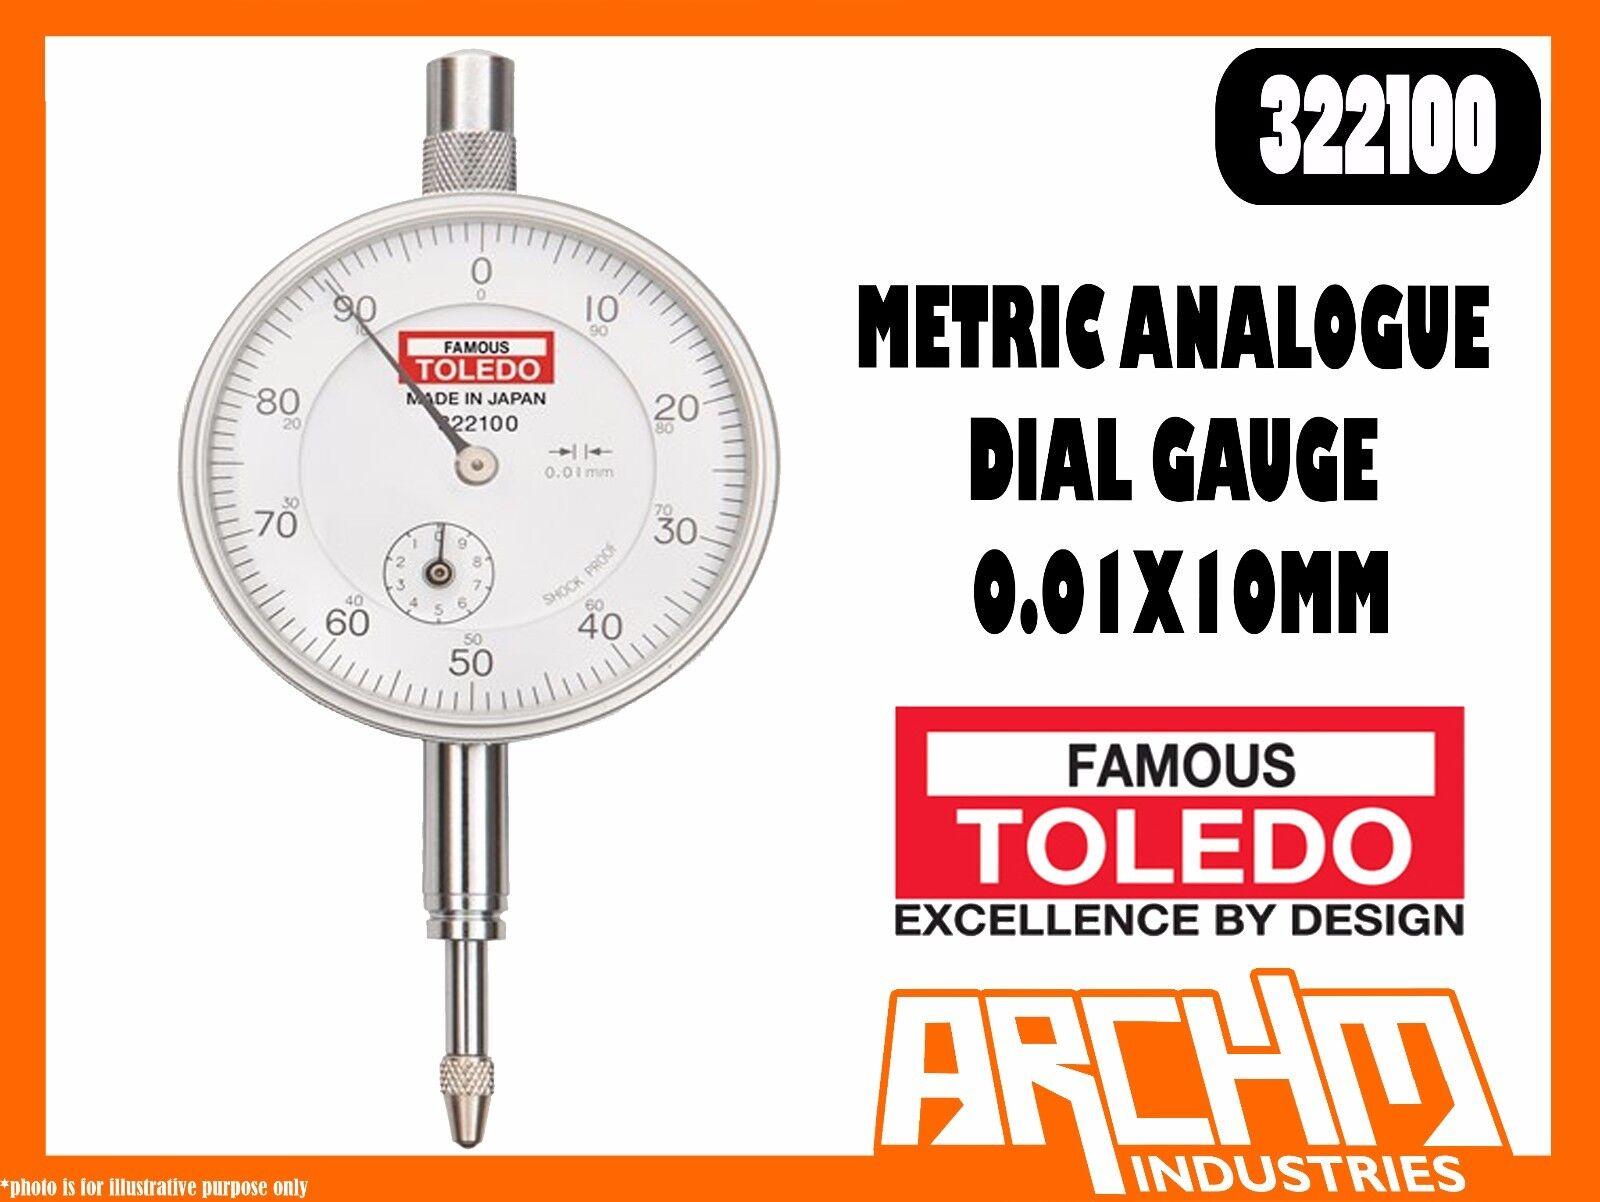 TOLEDO 322100 - METRIC ANALOGUE DIAL GAUGE - 0.01X10MM - HIGH PRECISION